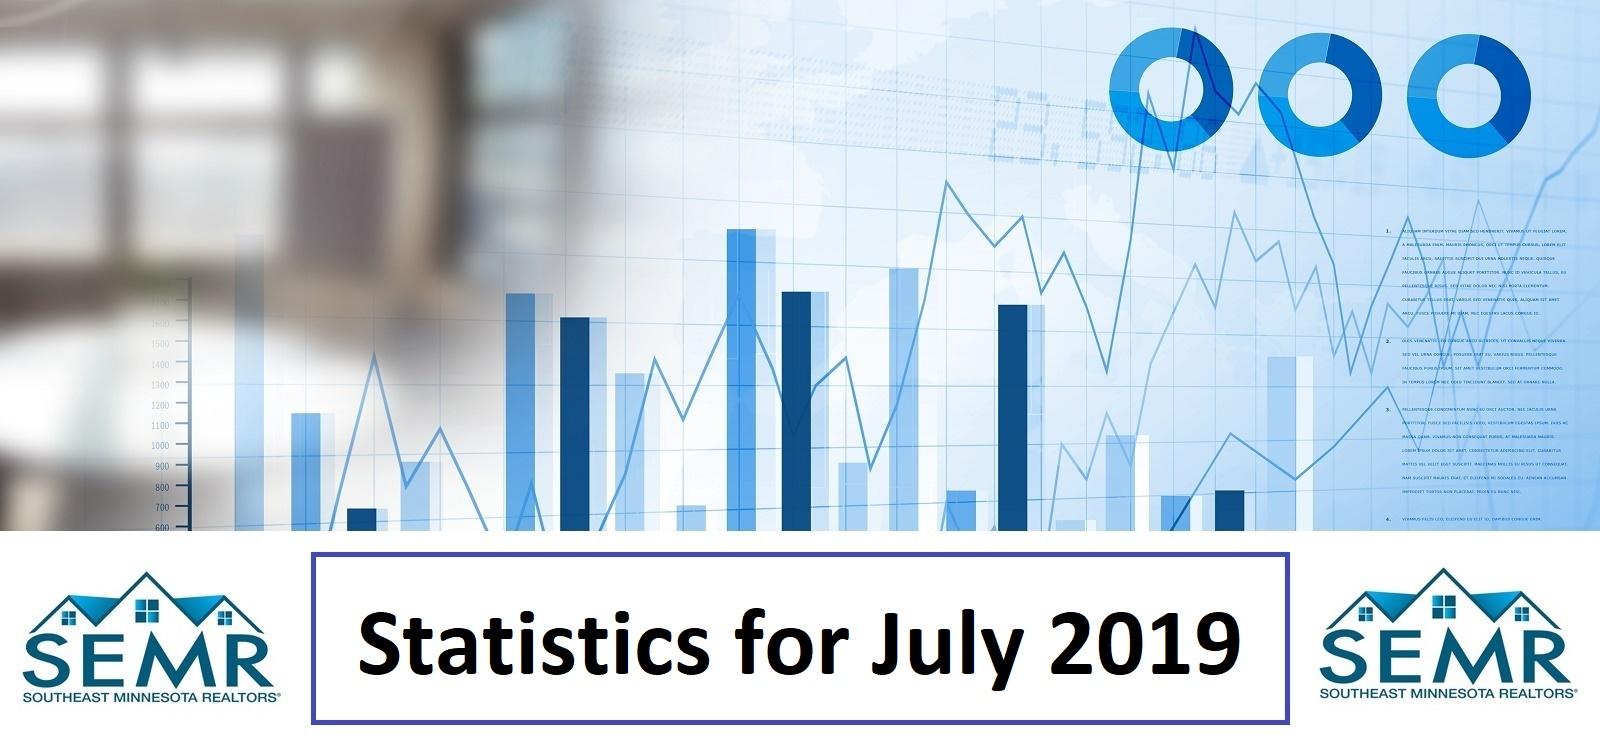 SEMR Statistics for June 2019